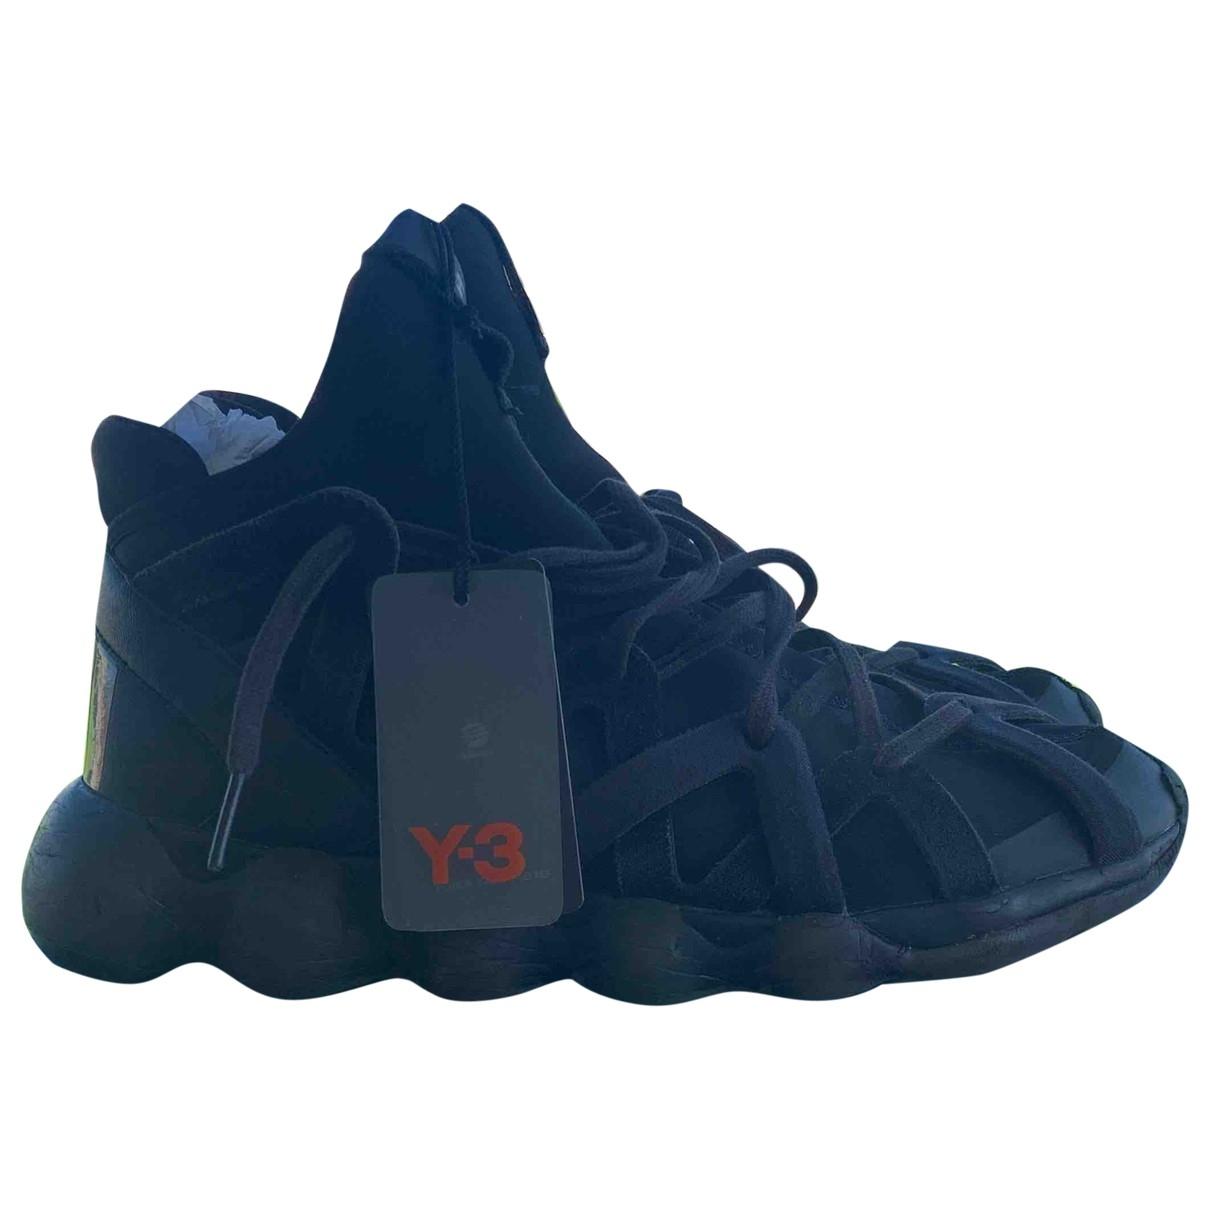 Y-3 By Yohji Yamamoto N Black Trainers for Men 8 US